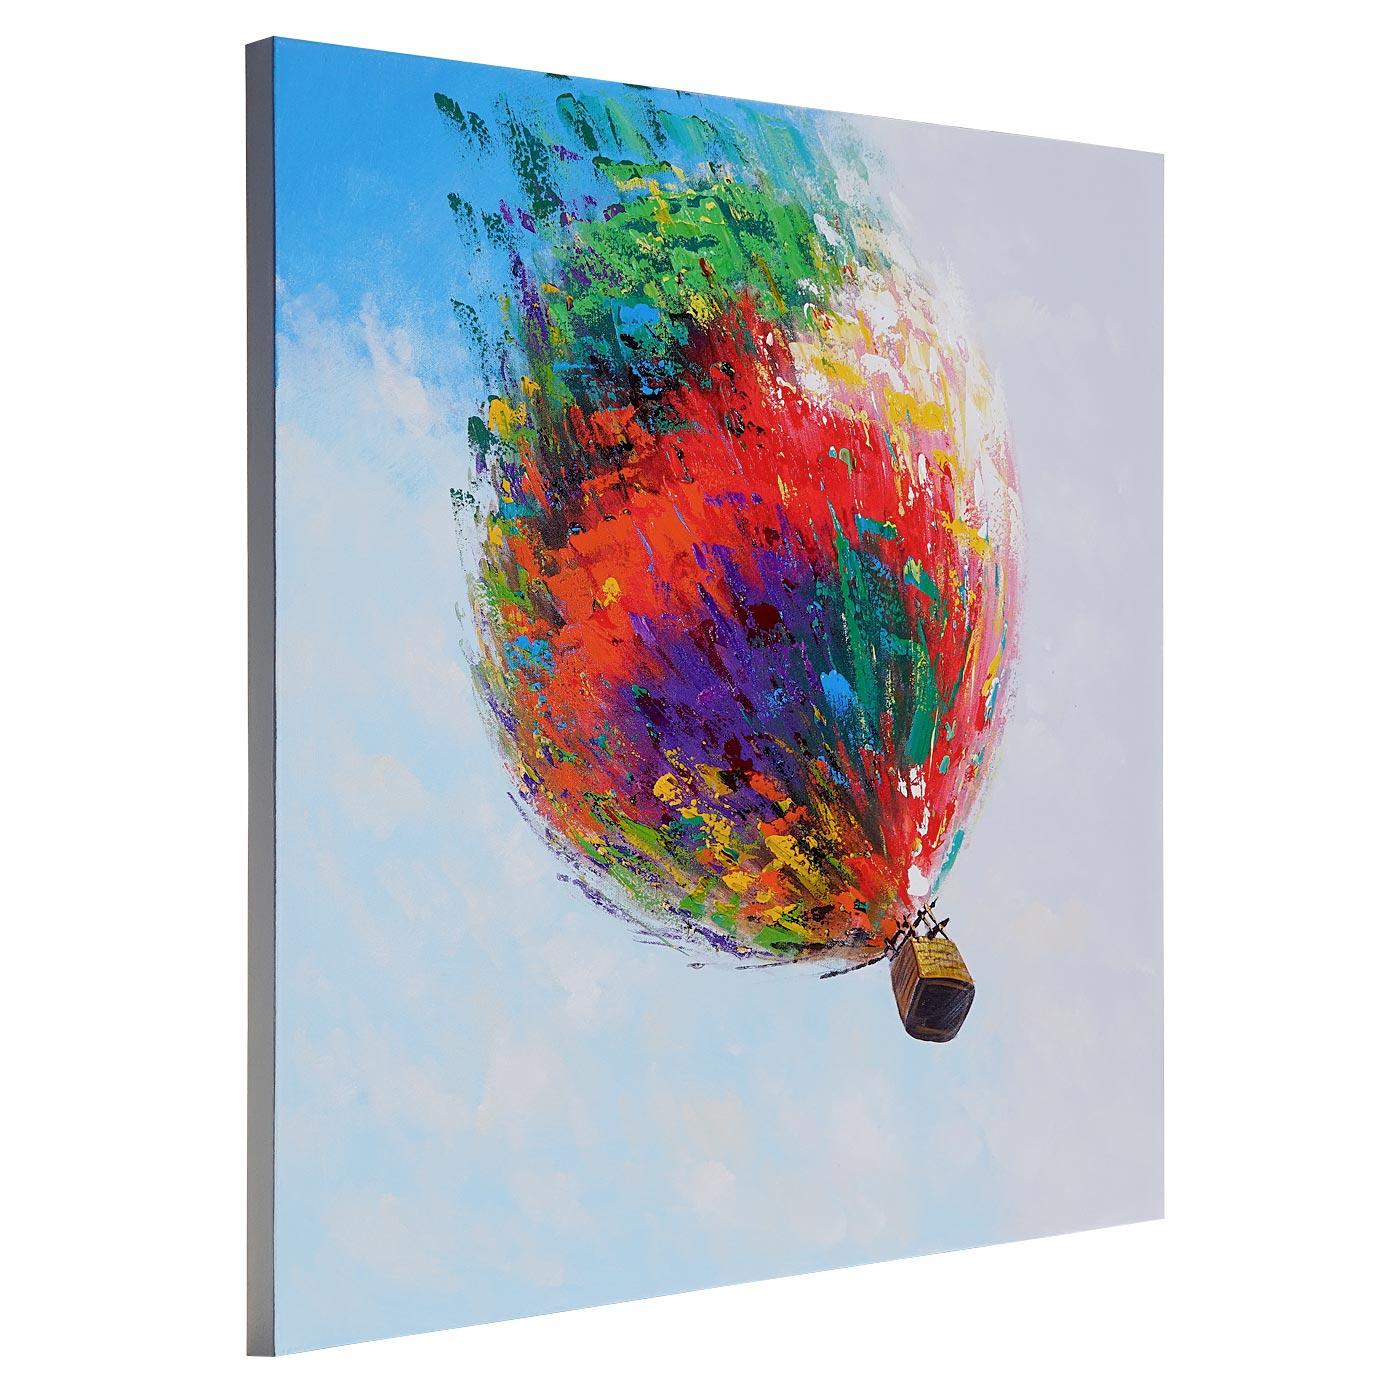 lgem lde hei luftballon 100 handgemaltes wandbild gem lde xl 100x100cm kaufen bei mendler. Black Bedroom Furniture Sets. Home Design Ideas